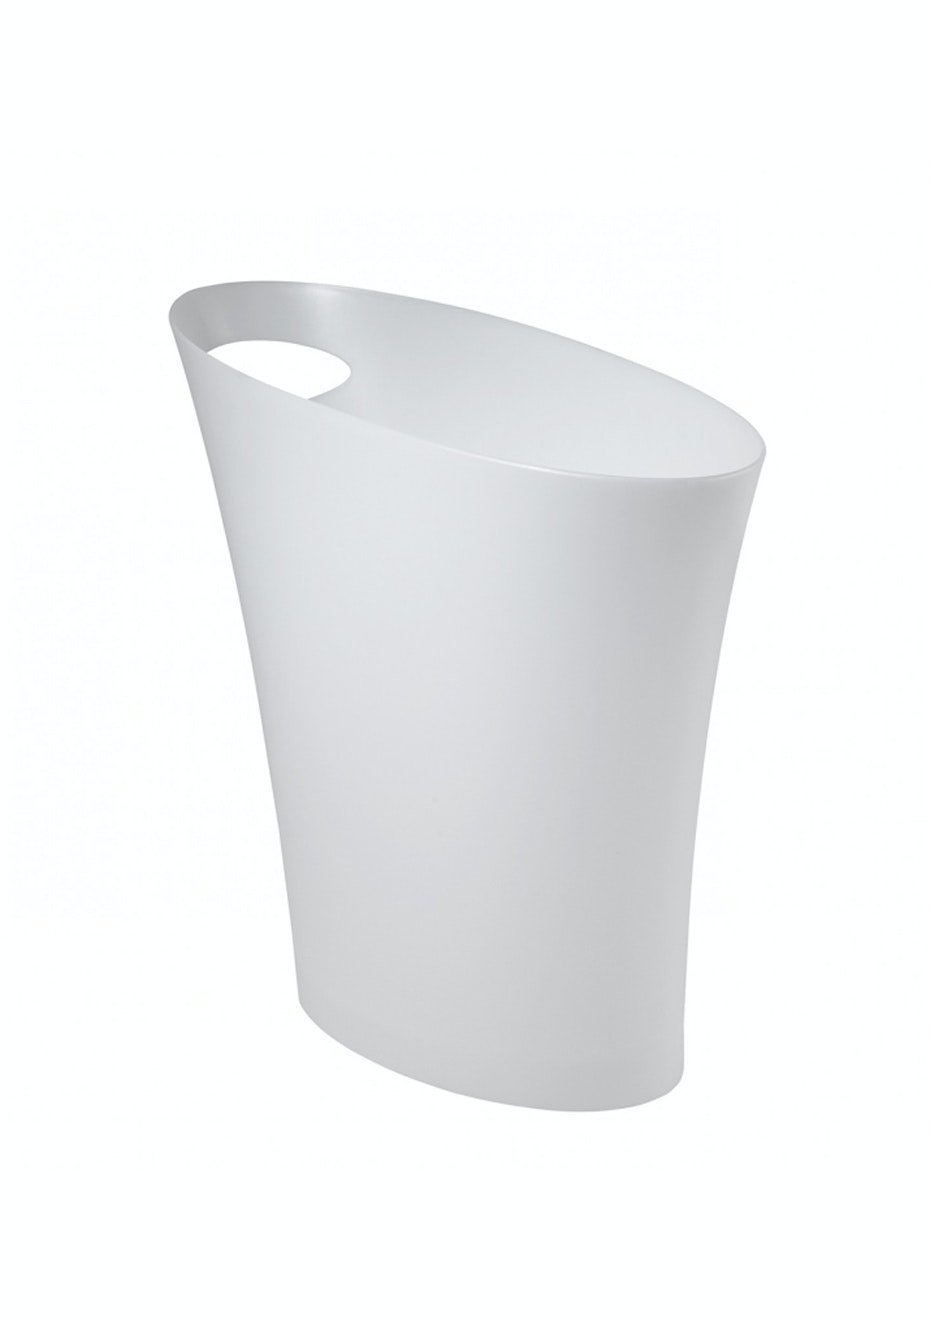 Umbra - Skinny - Can - Metallic White